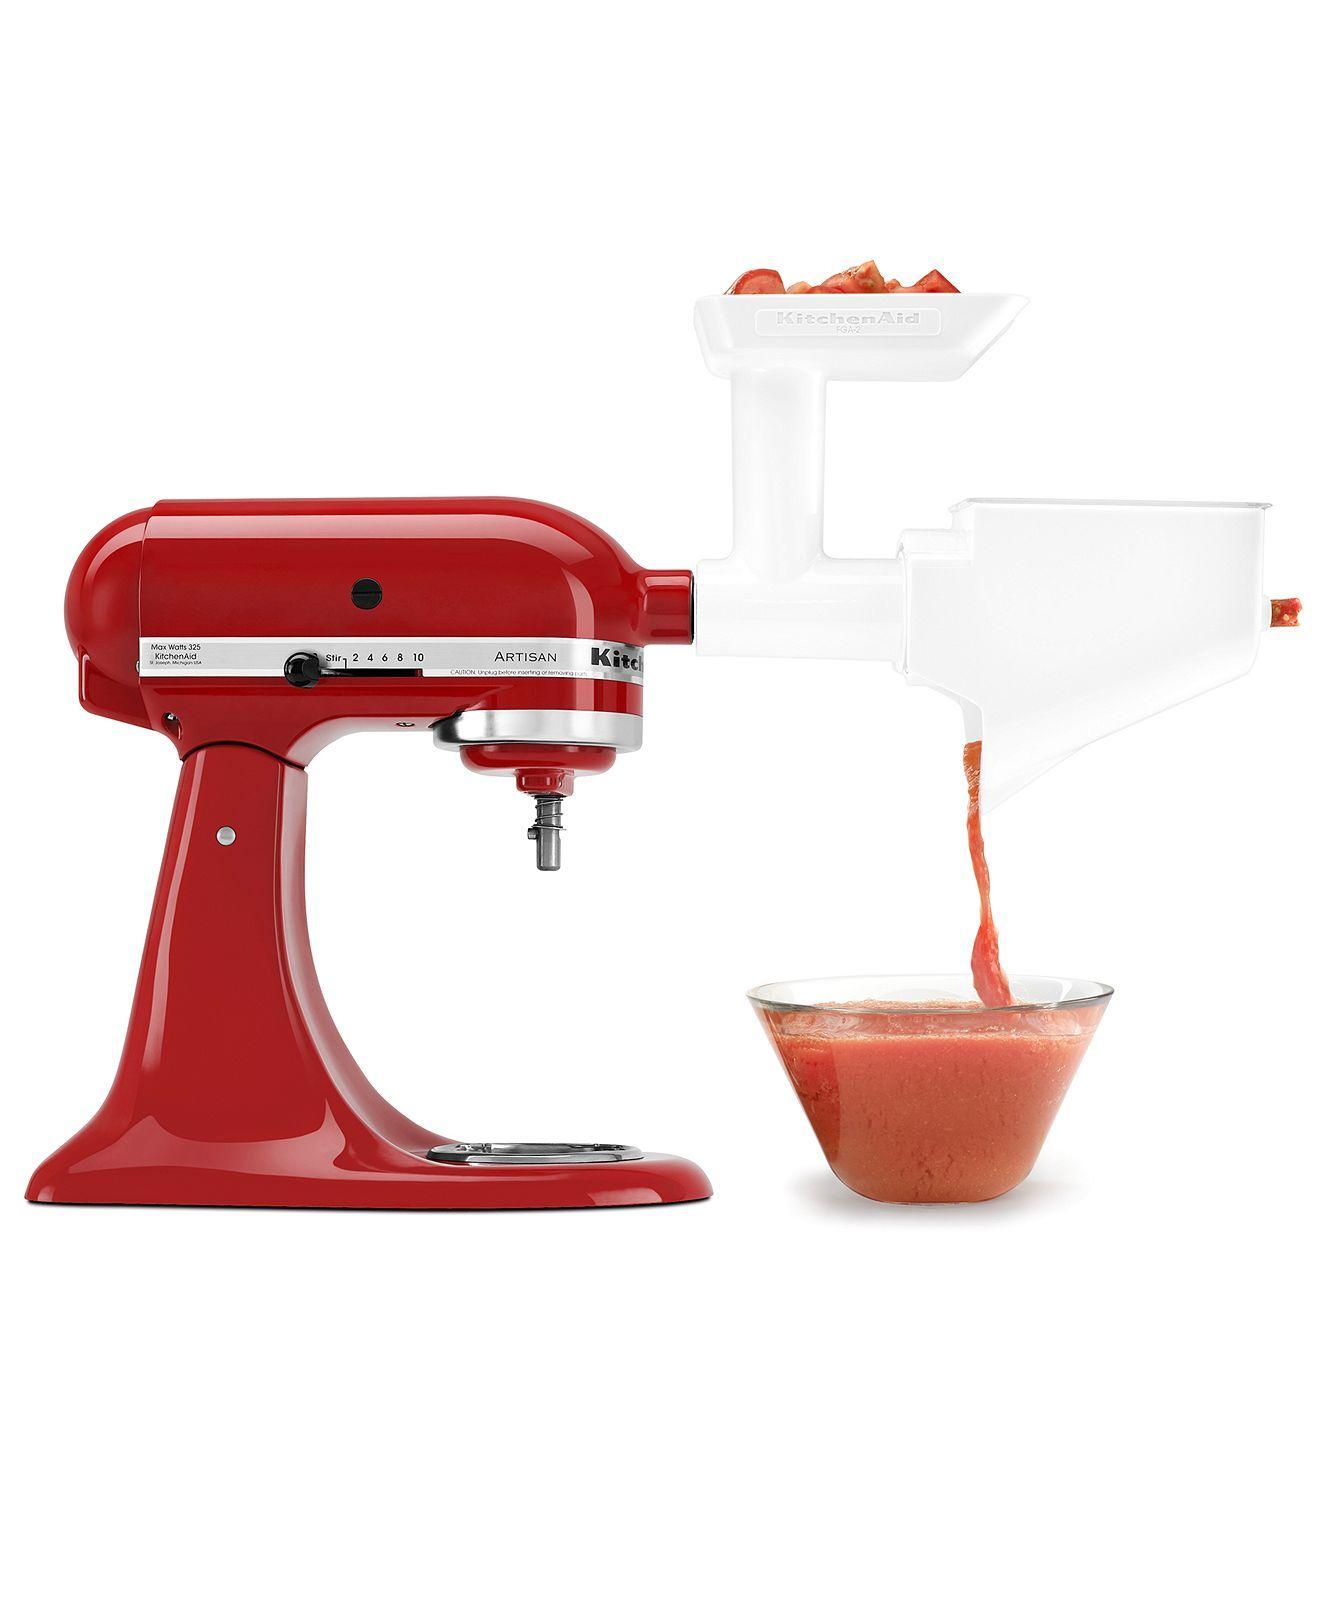 Kitchenaid fvsfga fruit vegetable strainer stand mixer